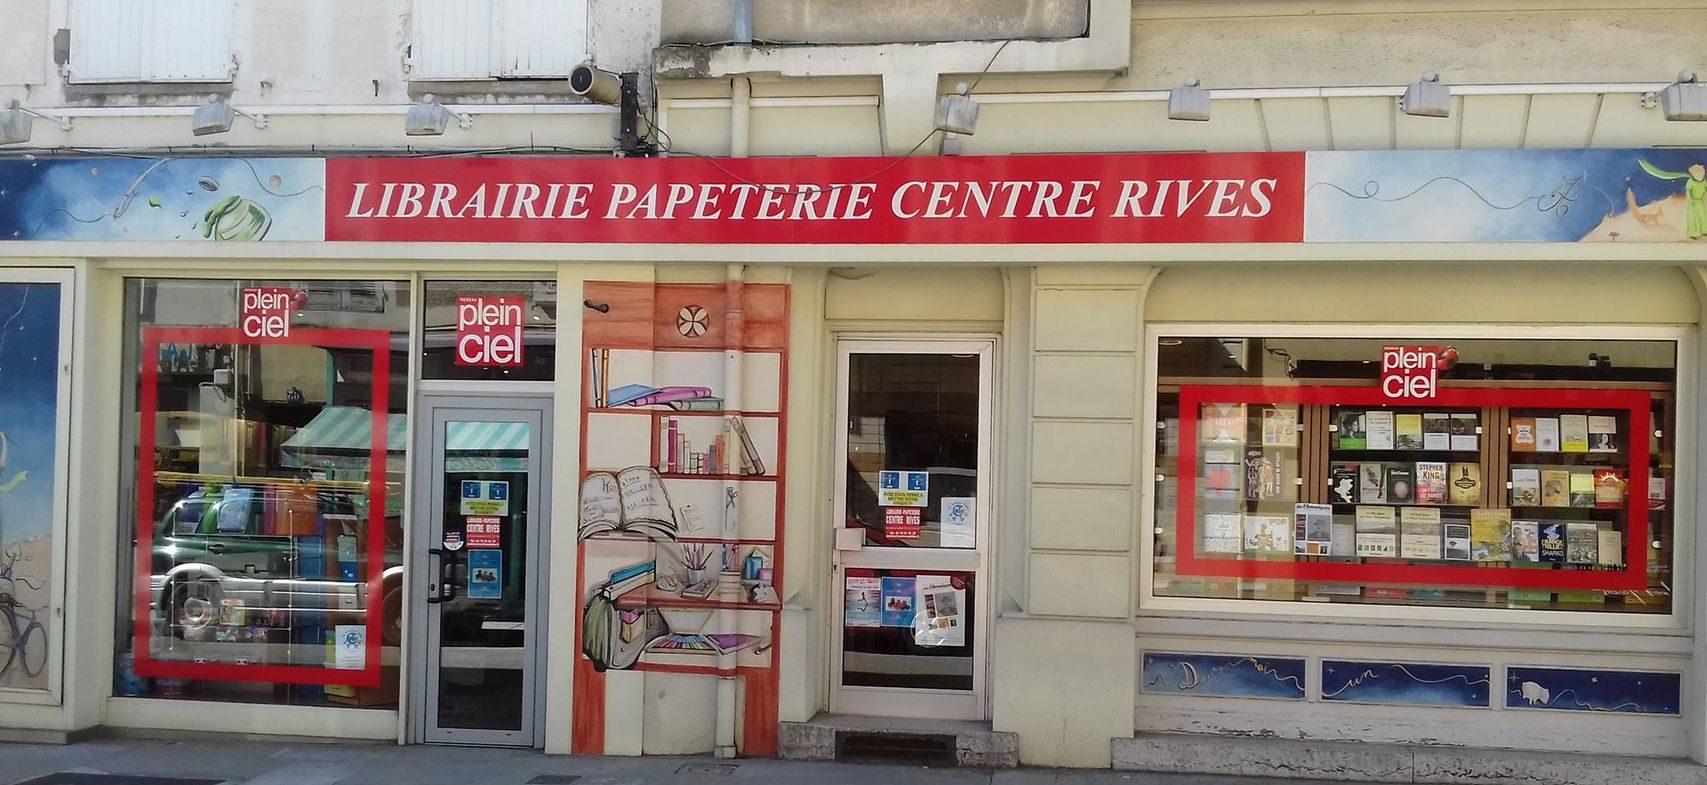 Librairie papeterie Centre Rives